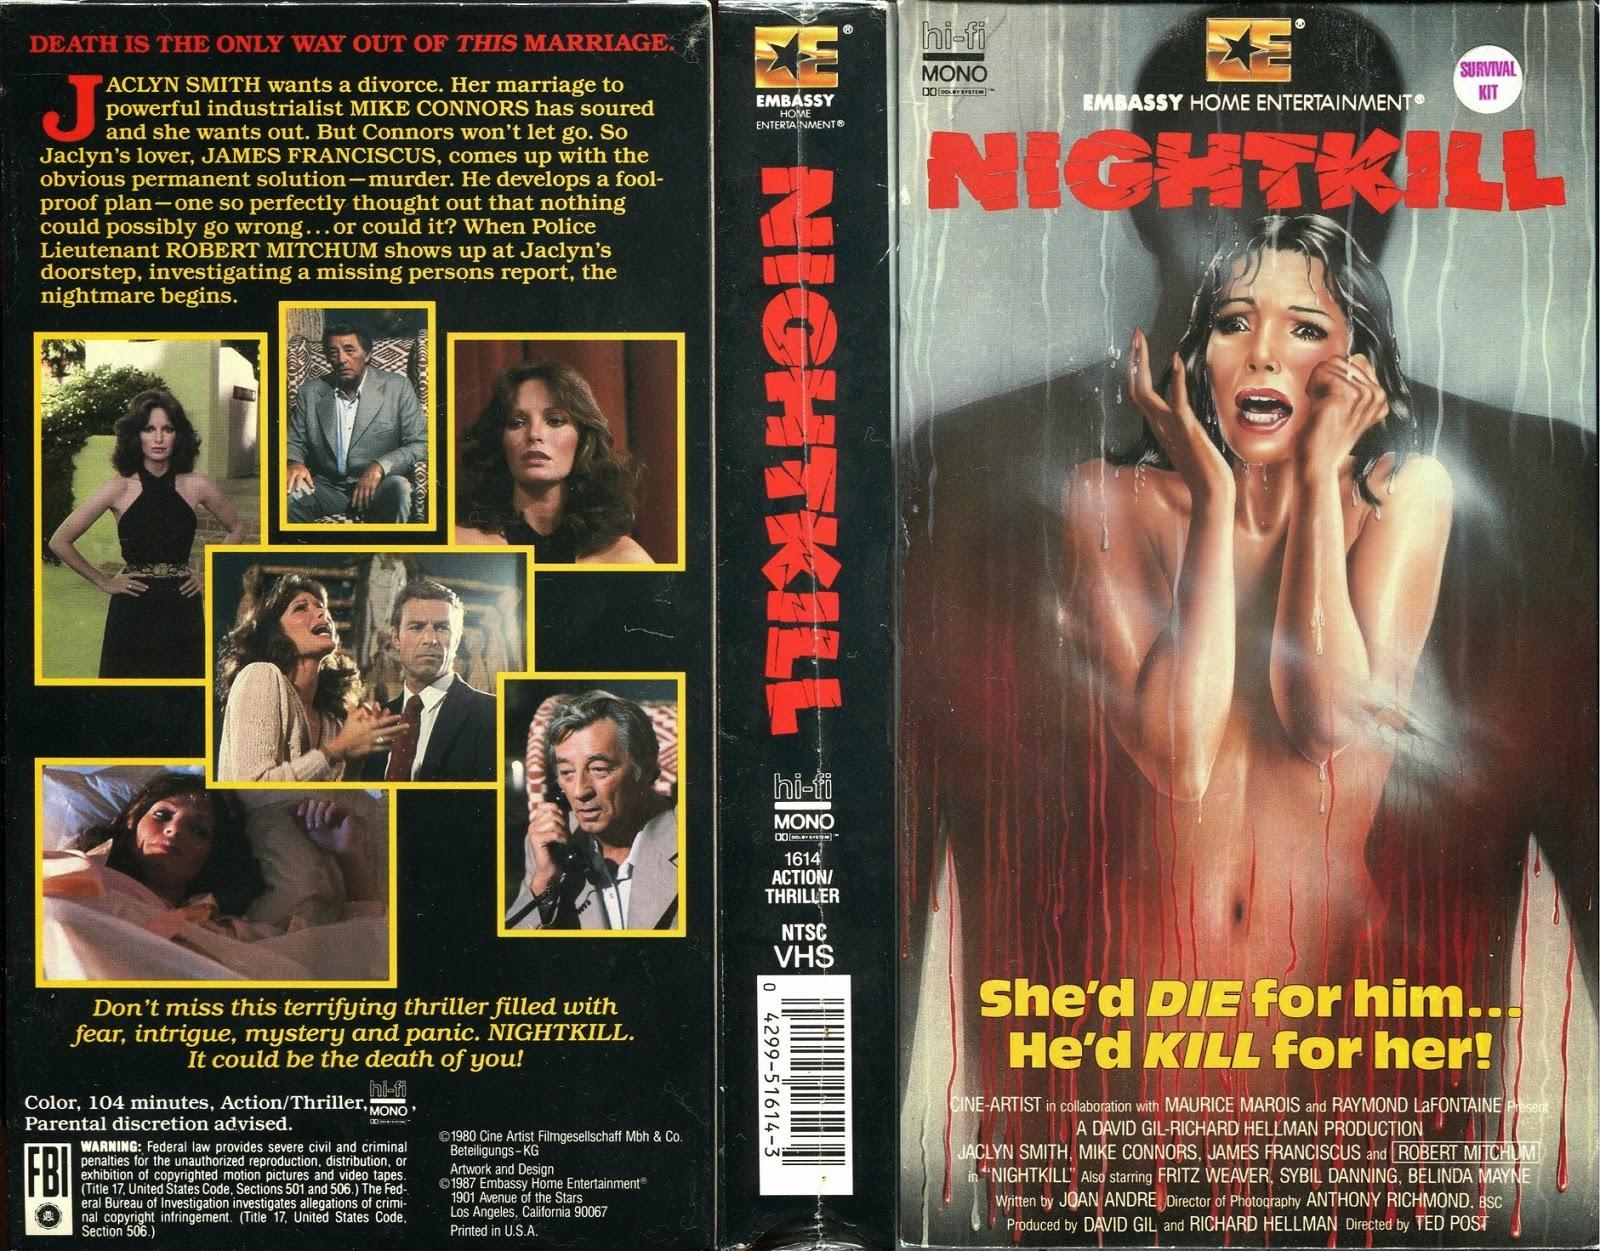 Hard choices 1987 scene 6 nina hartley nick random - 1 part 5